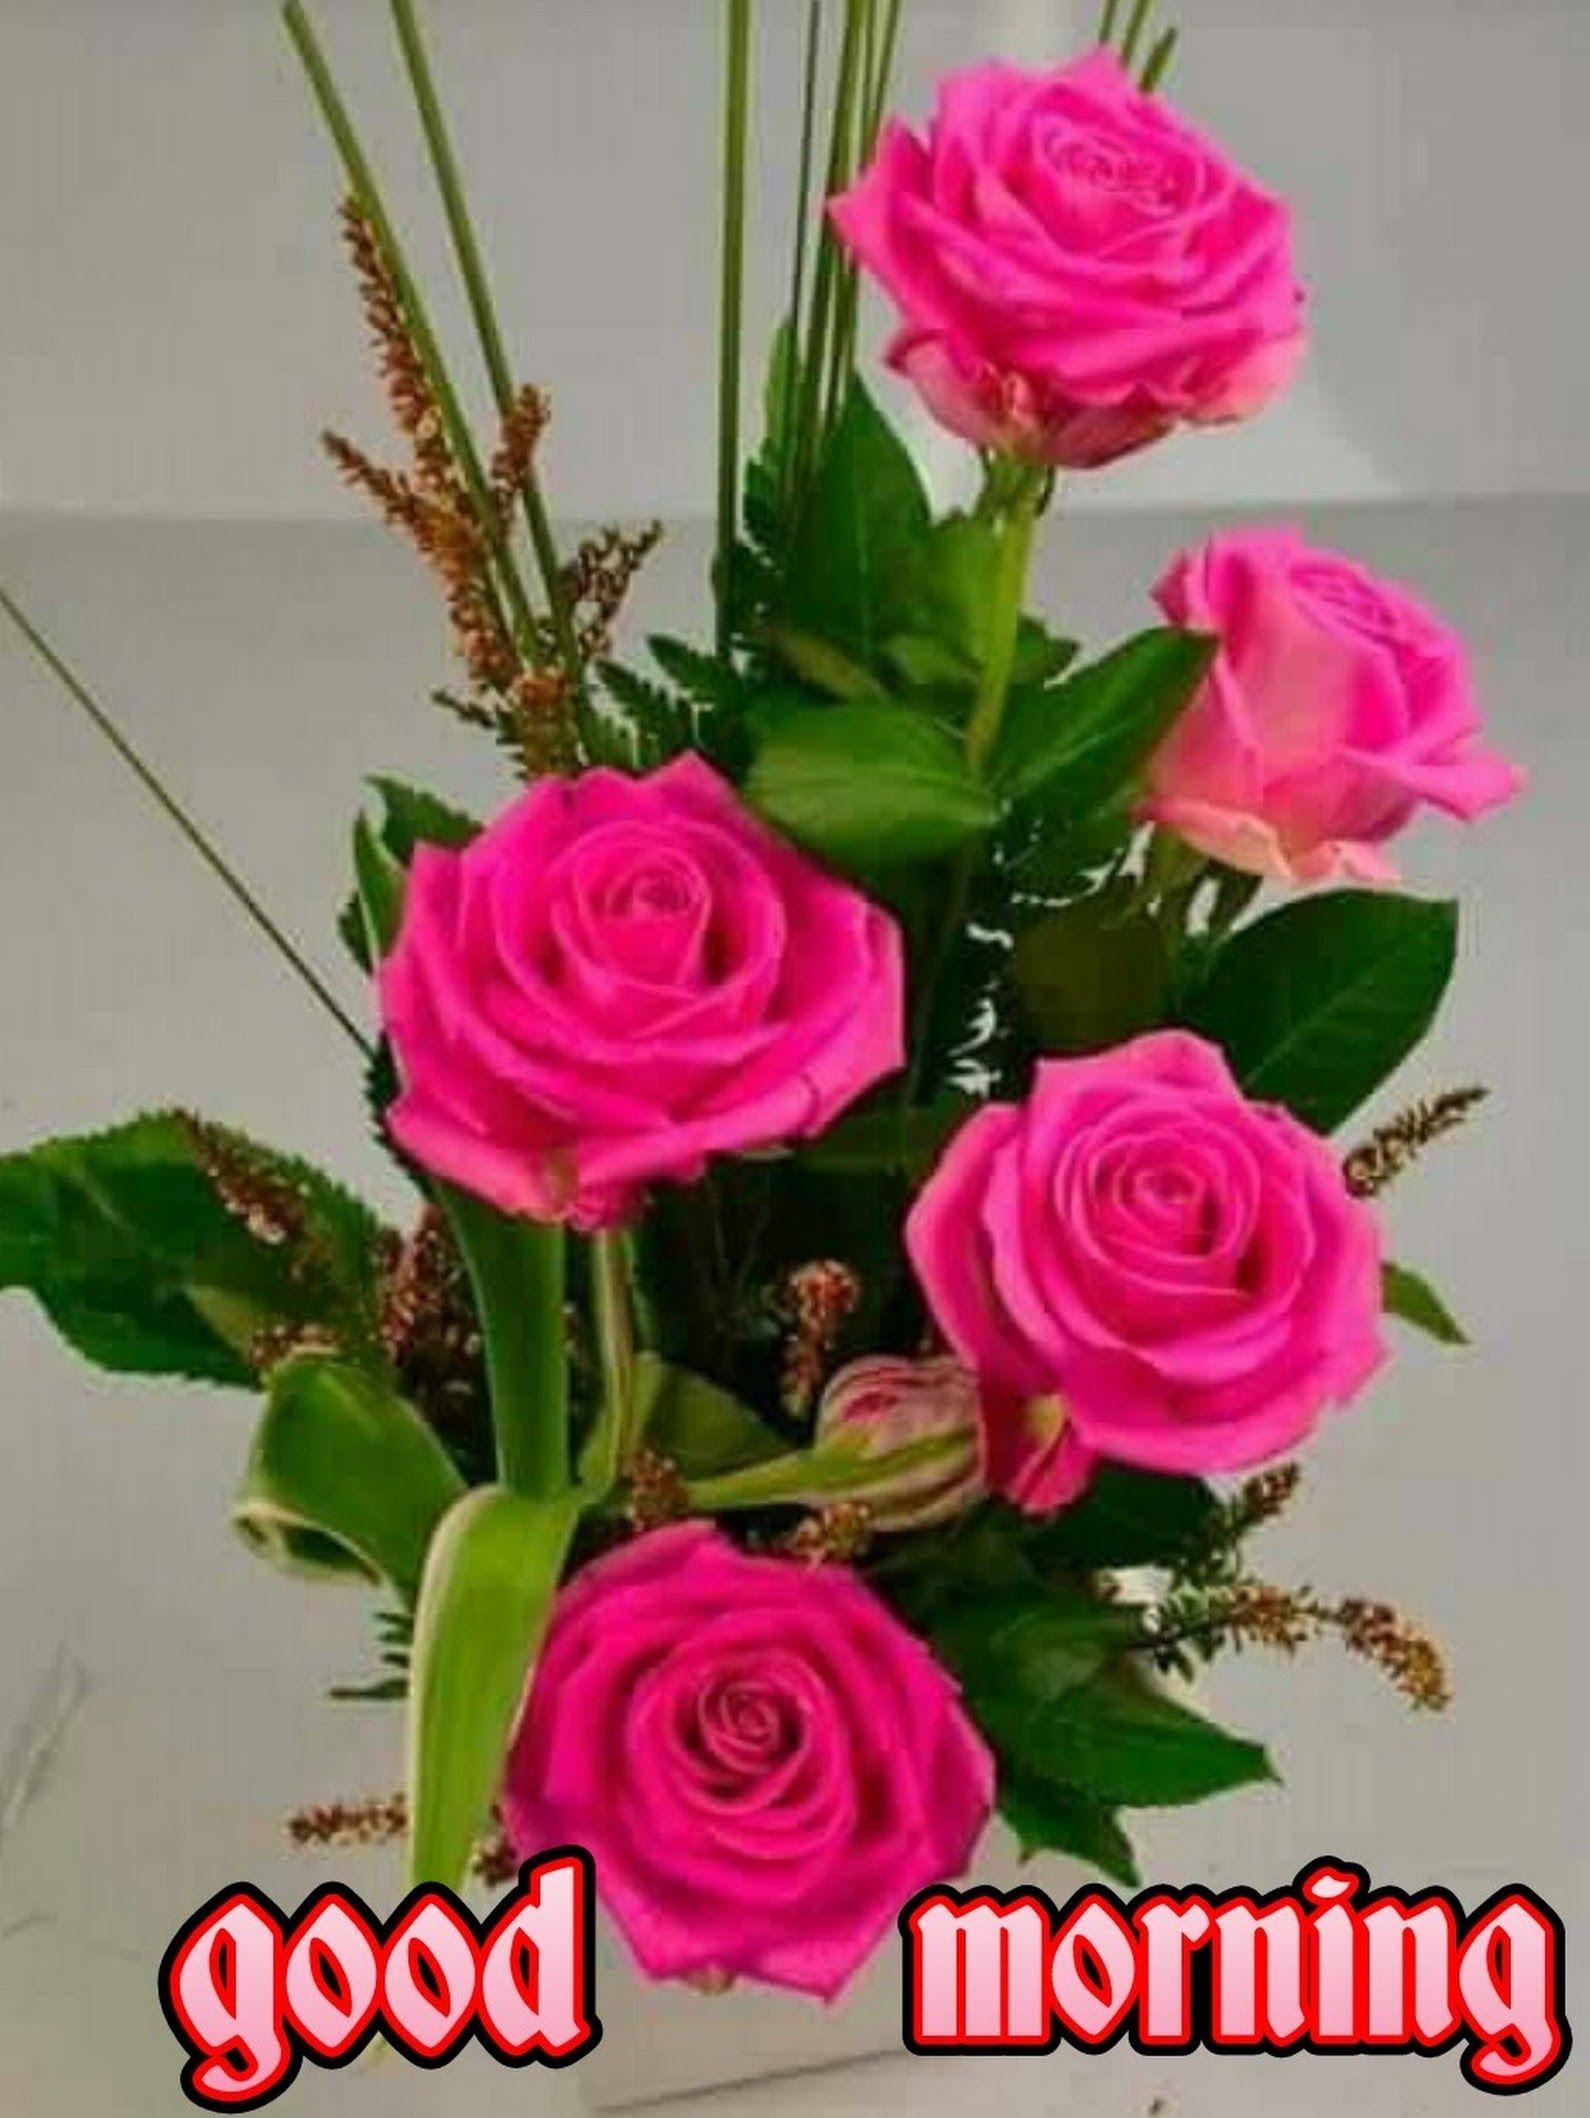 Good Morning Kishor Ekatpure Google Good Morning Rose Images Good Morning Flowers Lovely Good Morning Images